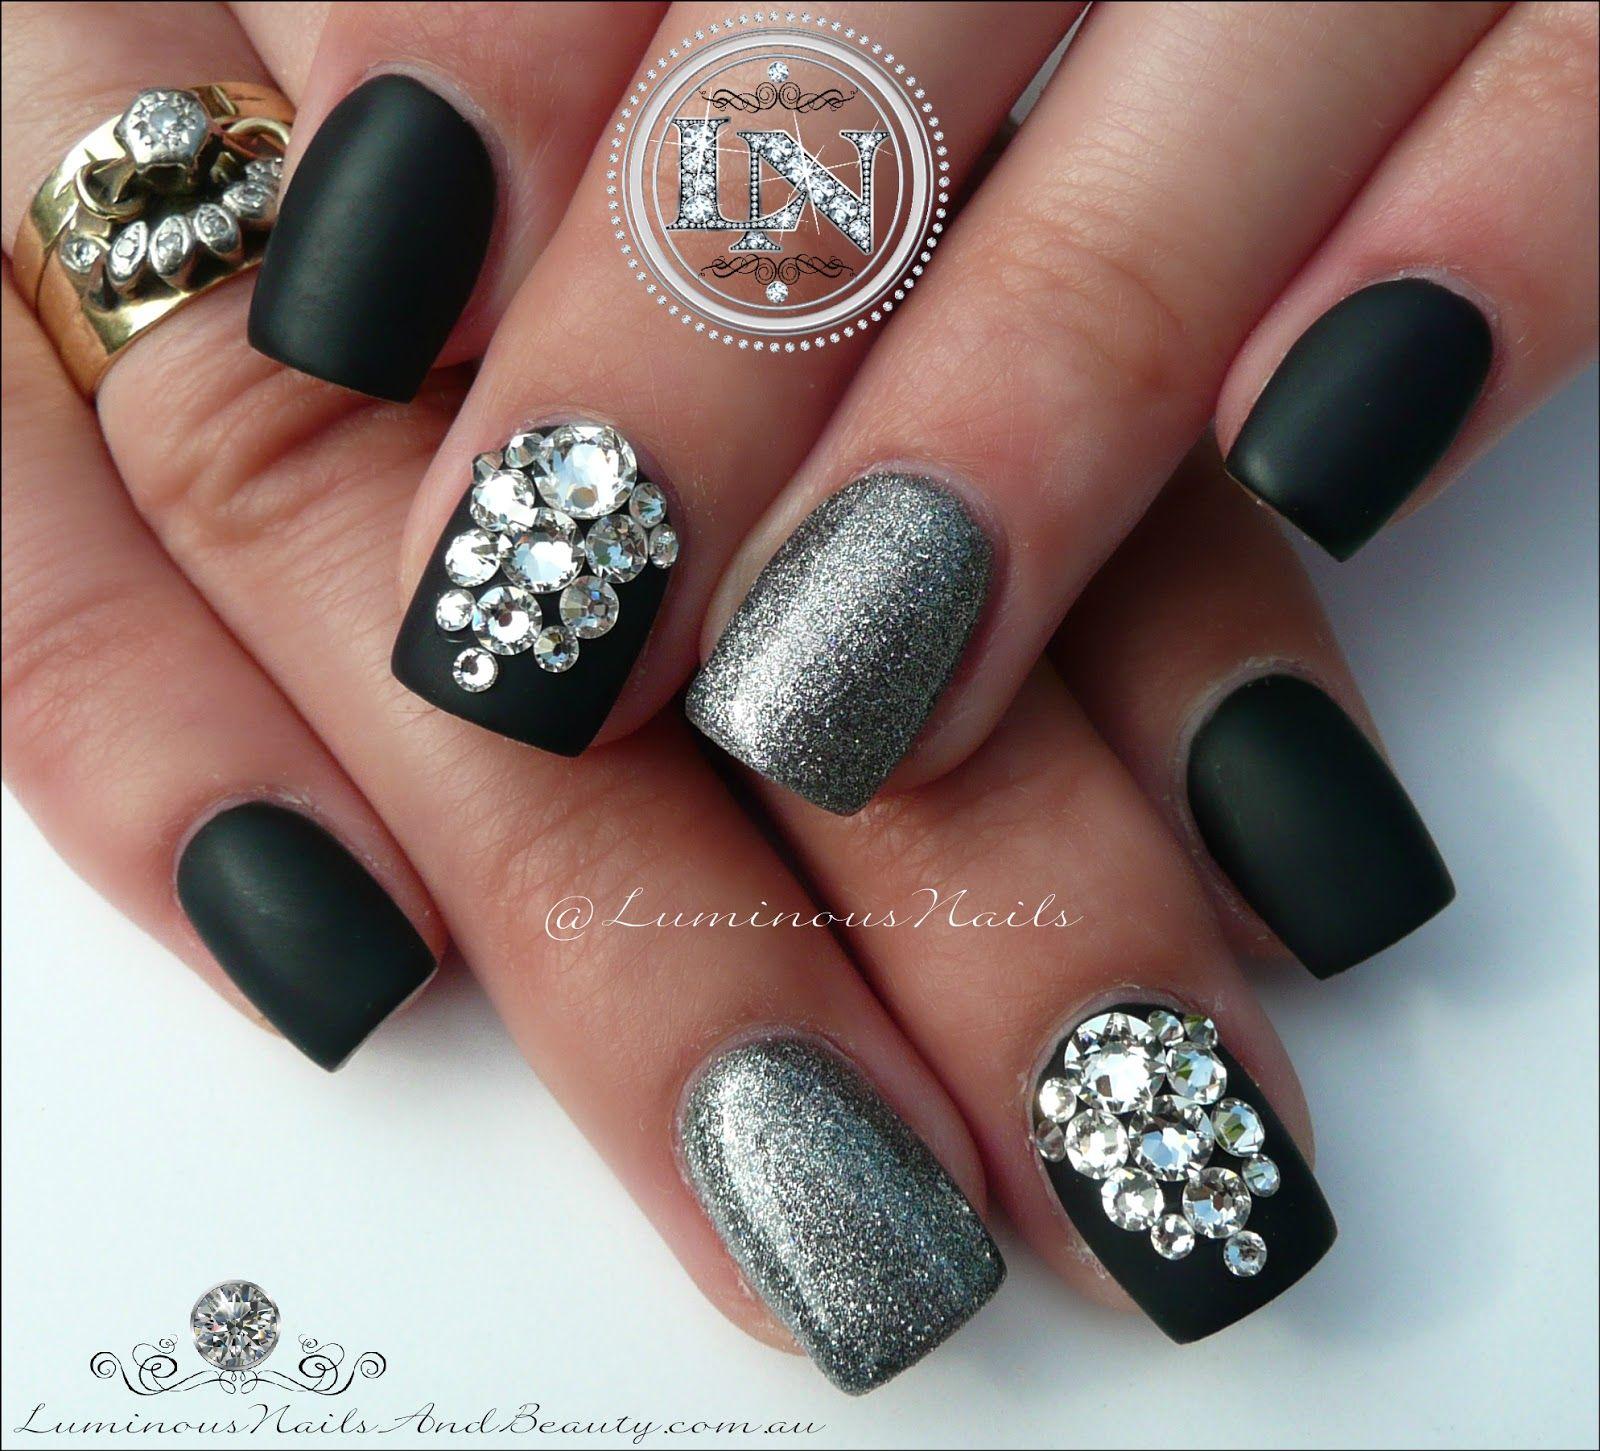 Luminous Nails: Matte Black & Steel Grey With Swarovski